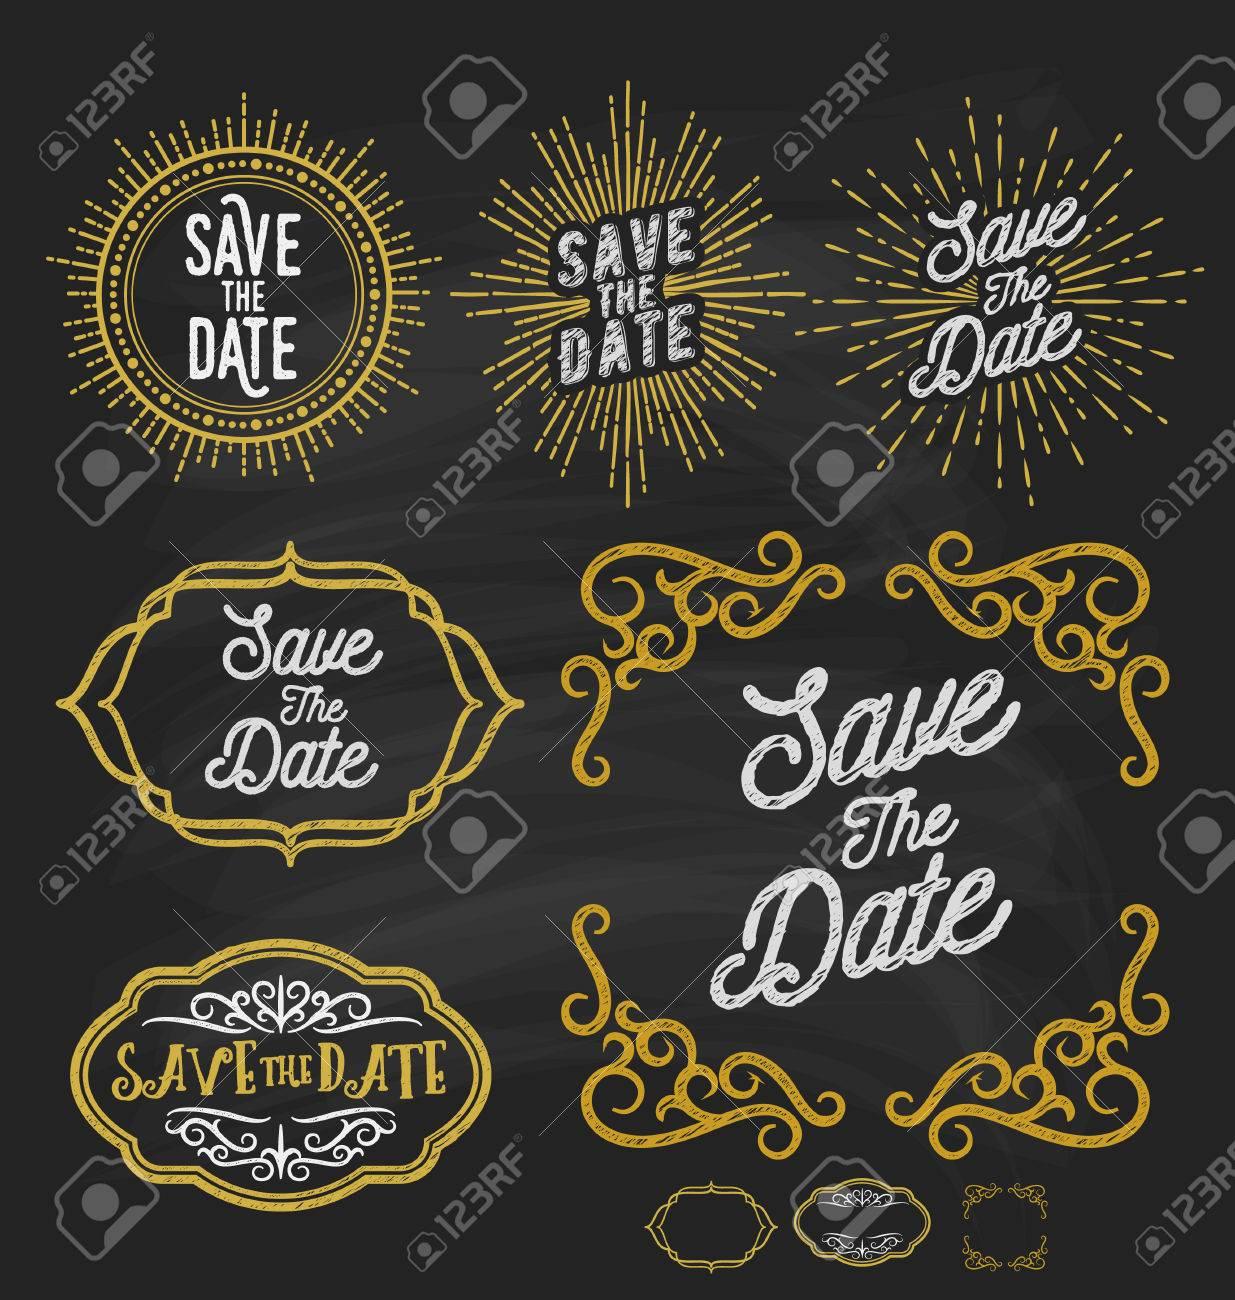 Save The Date Frame Border Chalkboard Style Vintage Sunburst And Flourish Line Corner